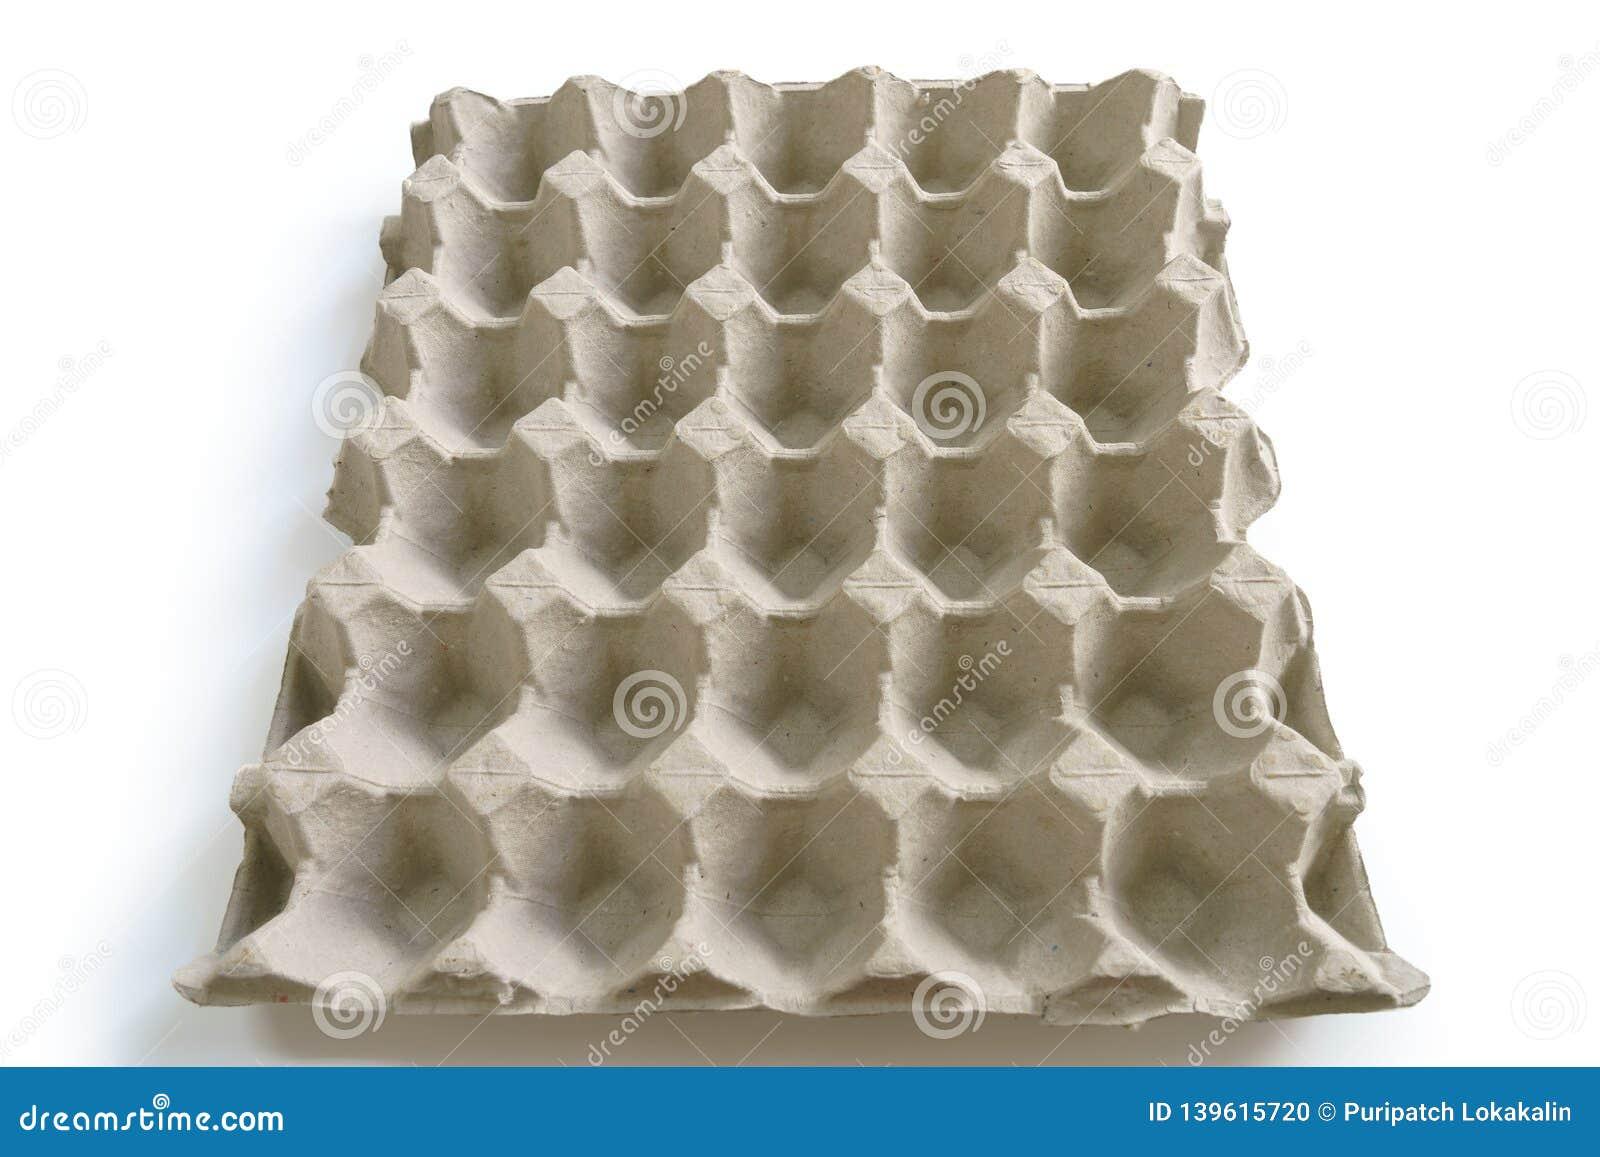 An empty egg tray